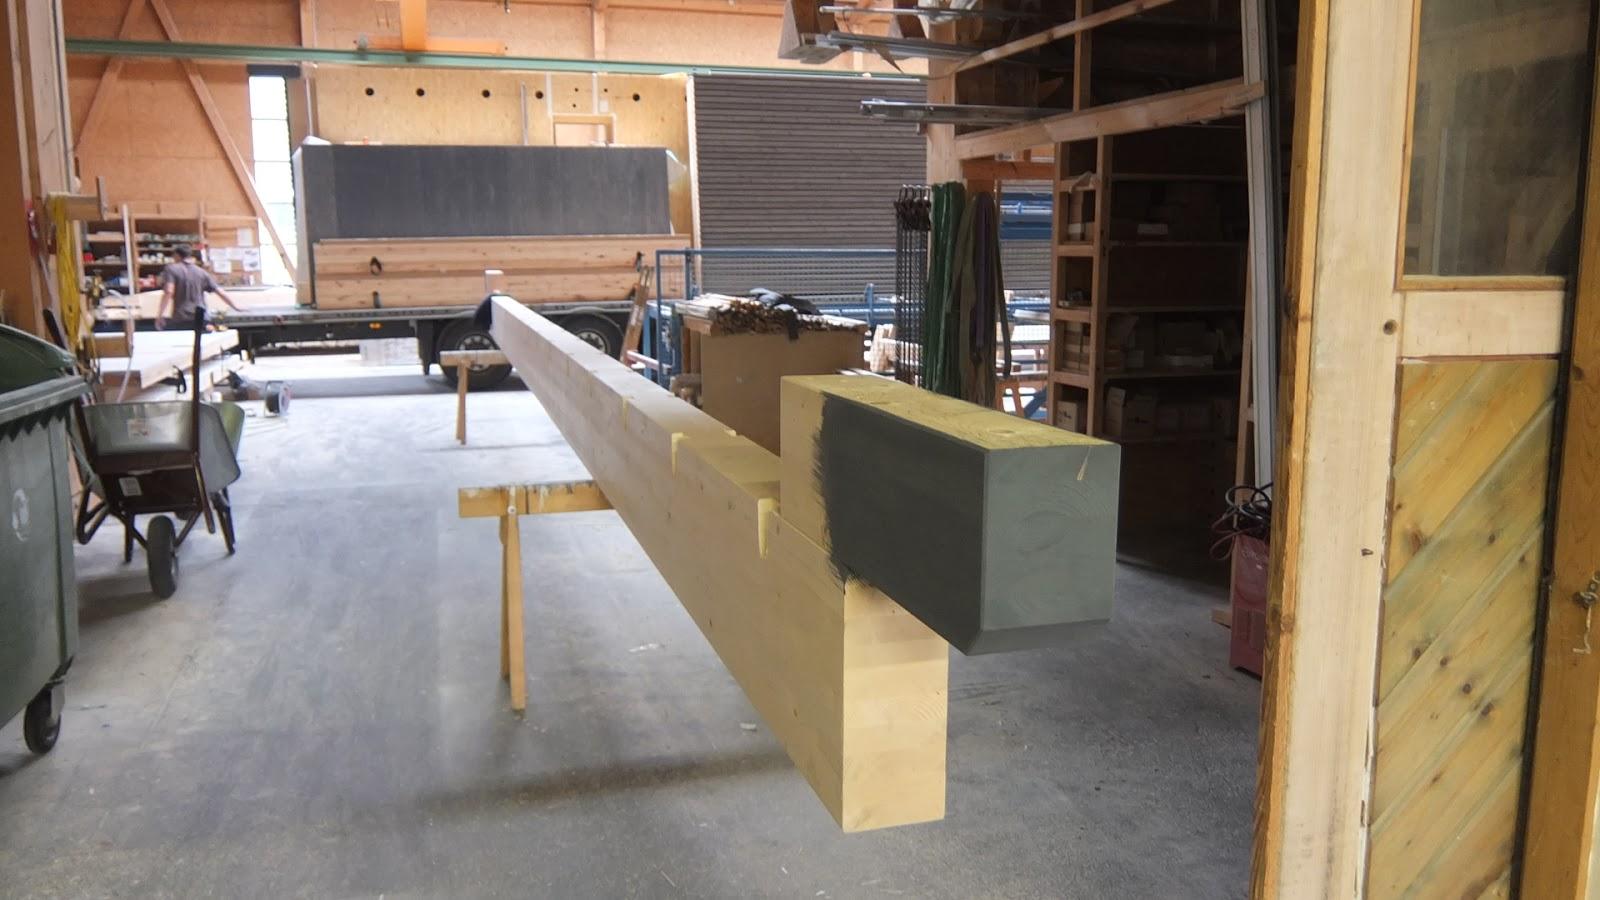 aua 39 s baublog august 2015. Black Bedroom Furniture Sets. Home Design Ideas